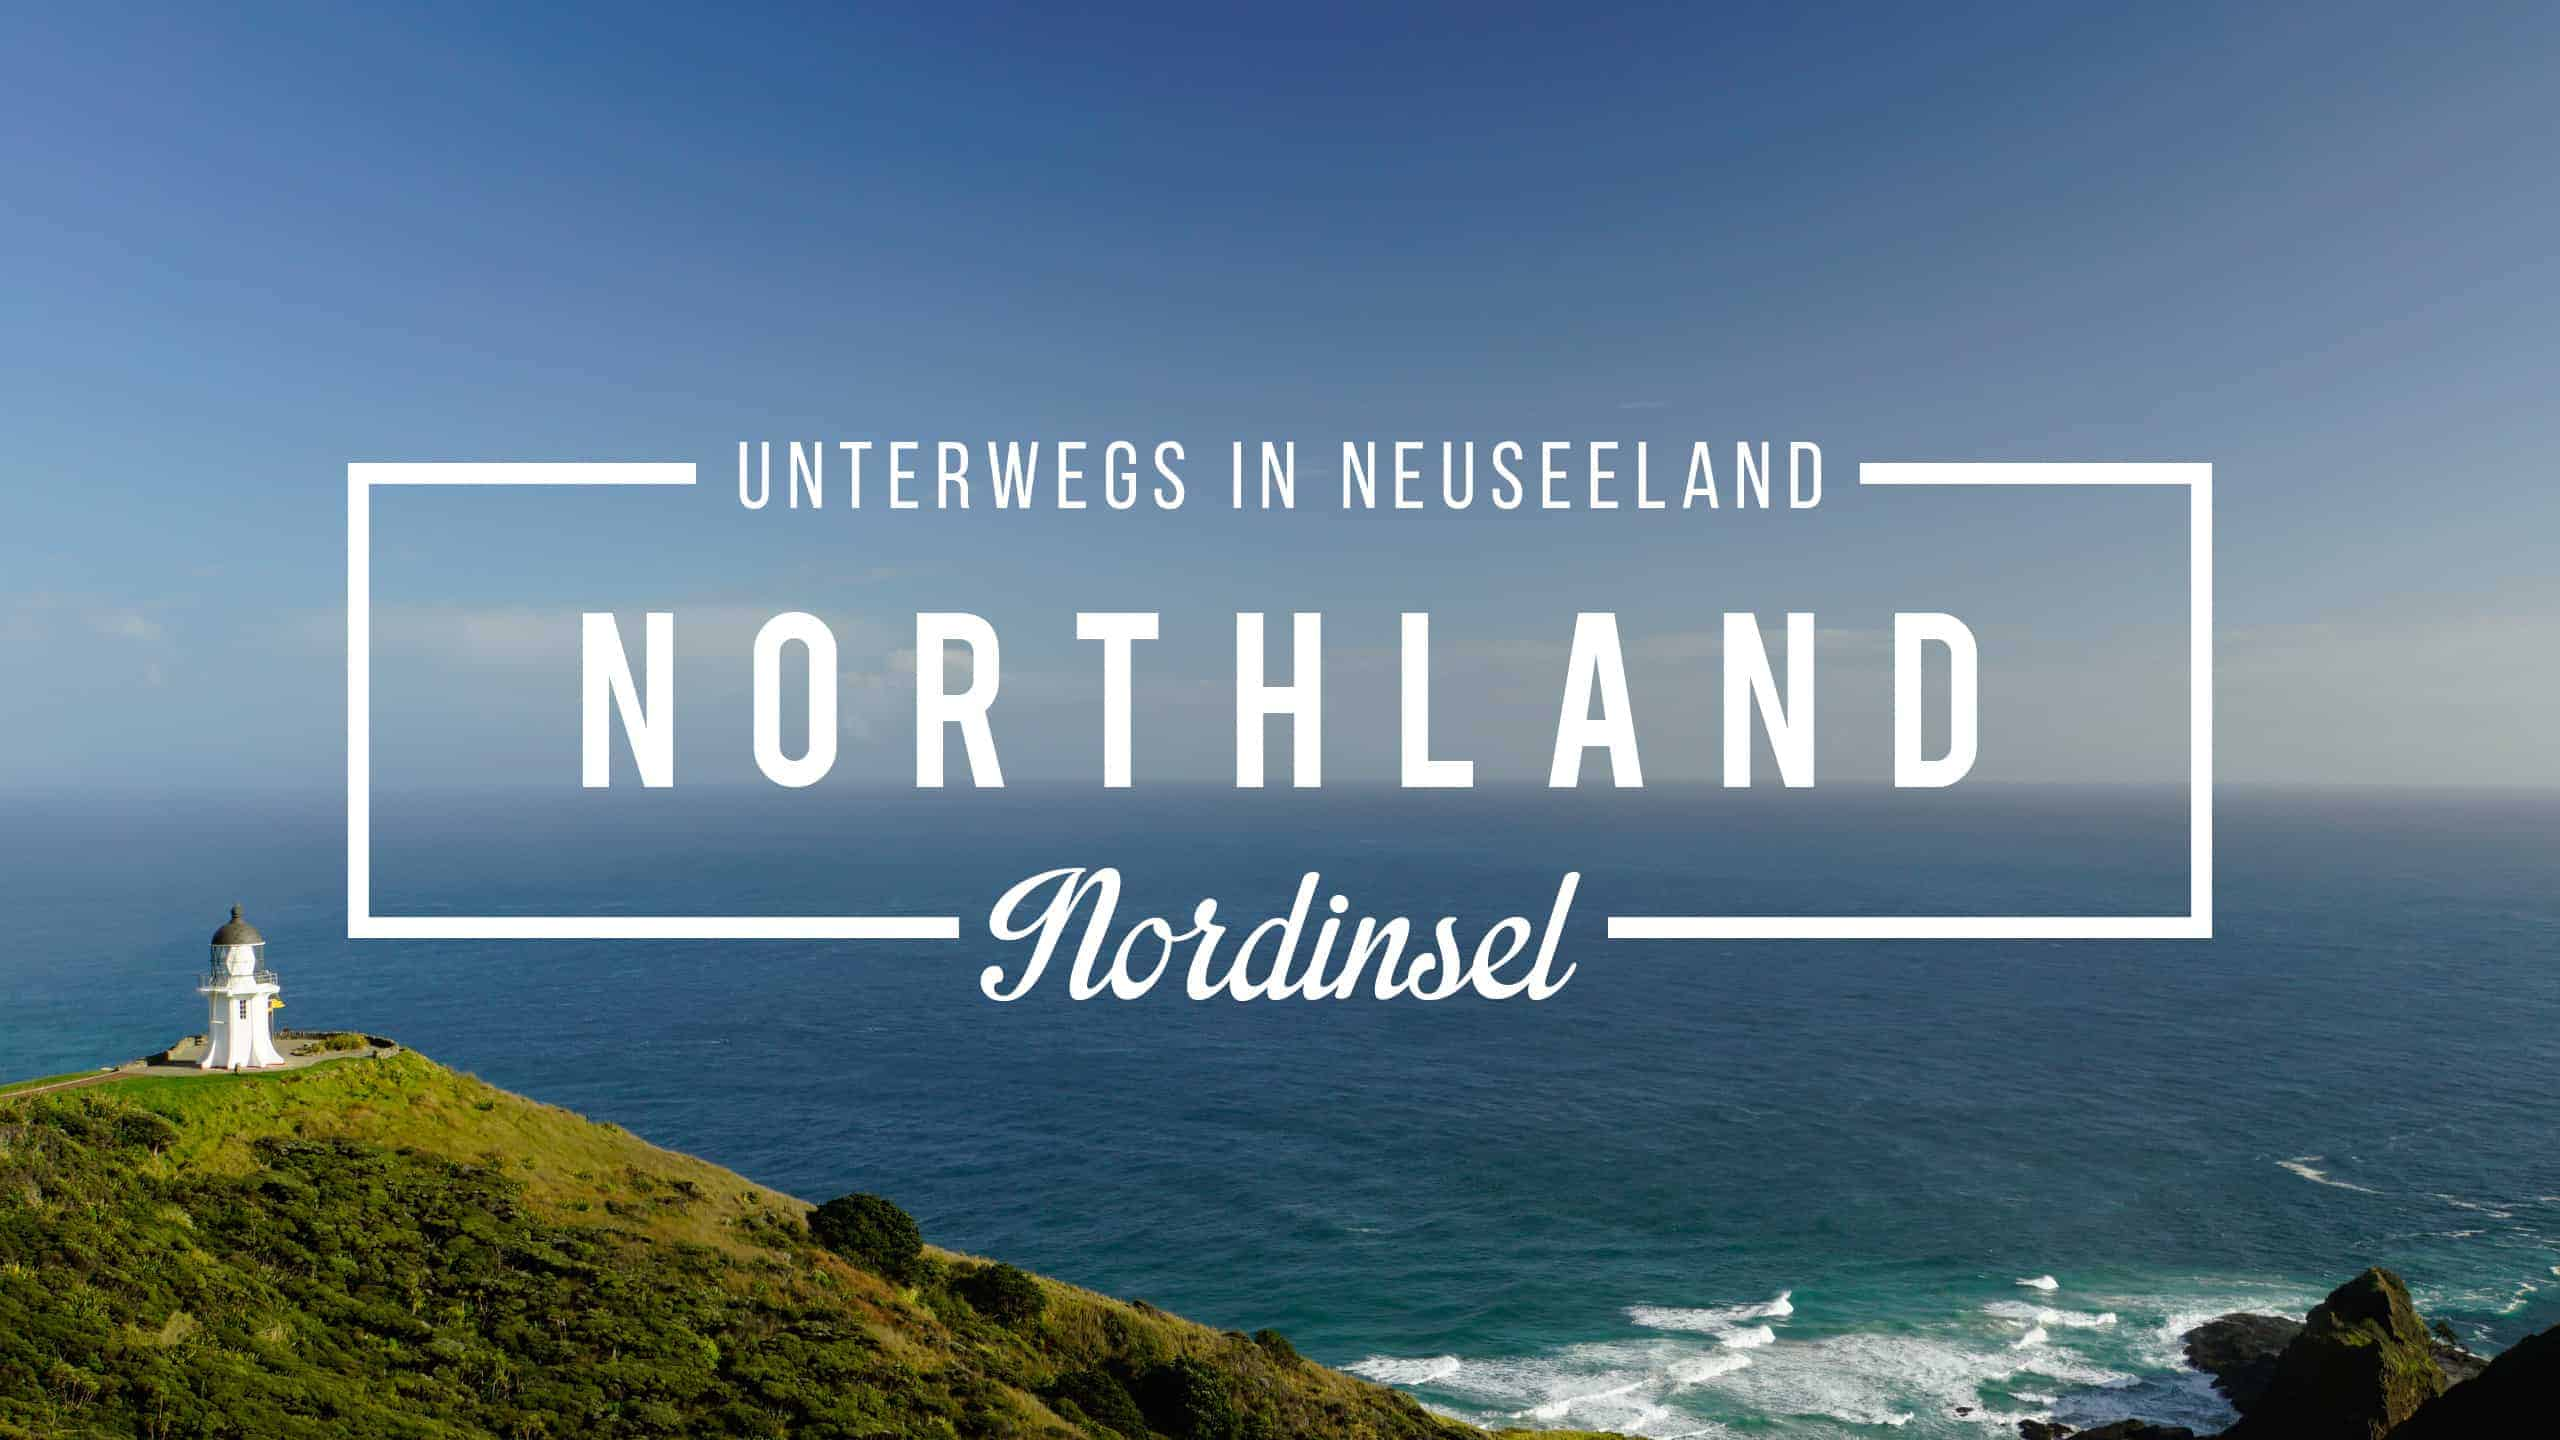 neuseeland-route-northland